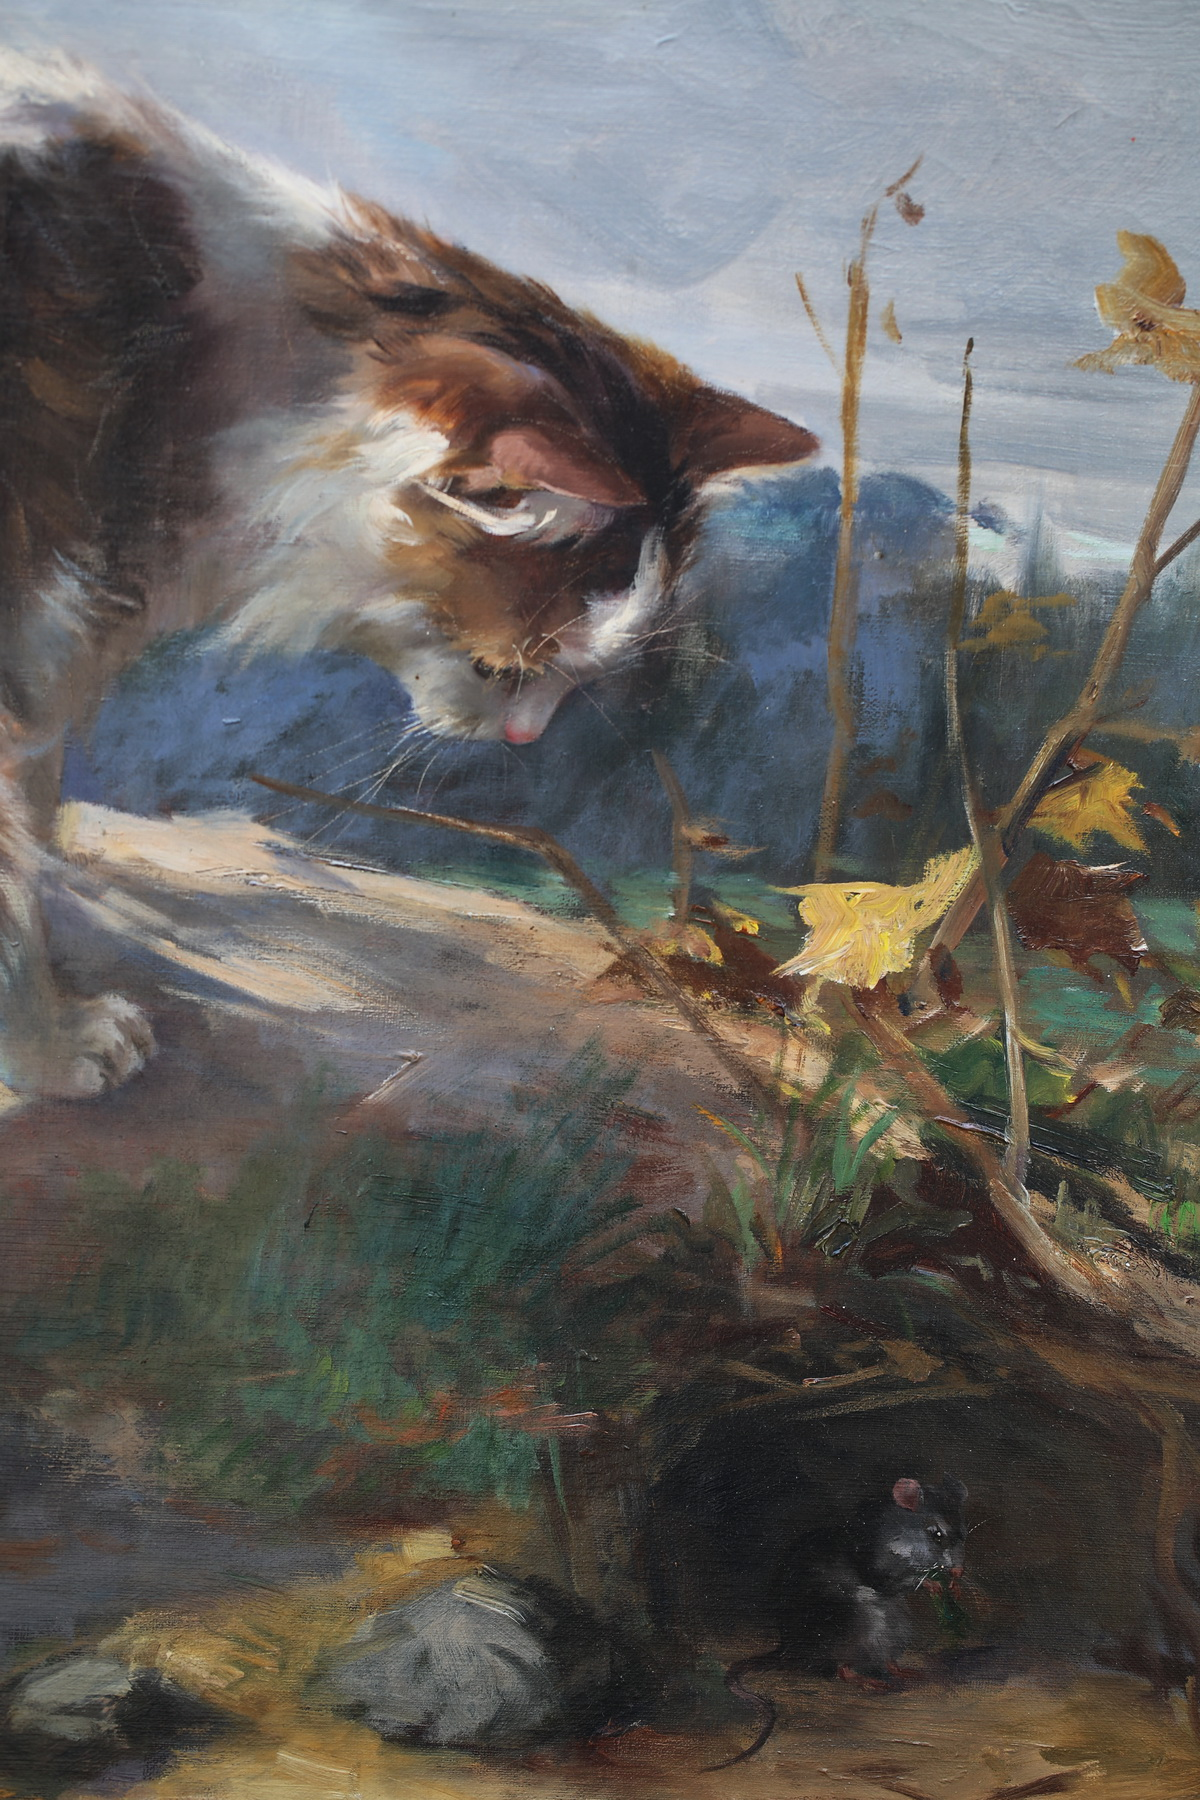 Jane de Hazon de Saint Firmin 1874-?